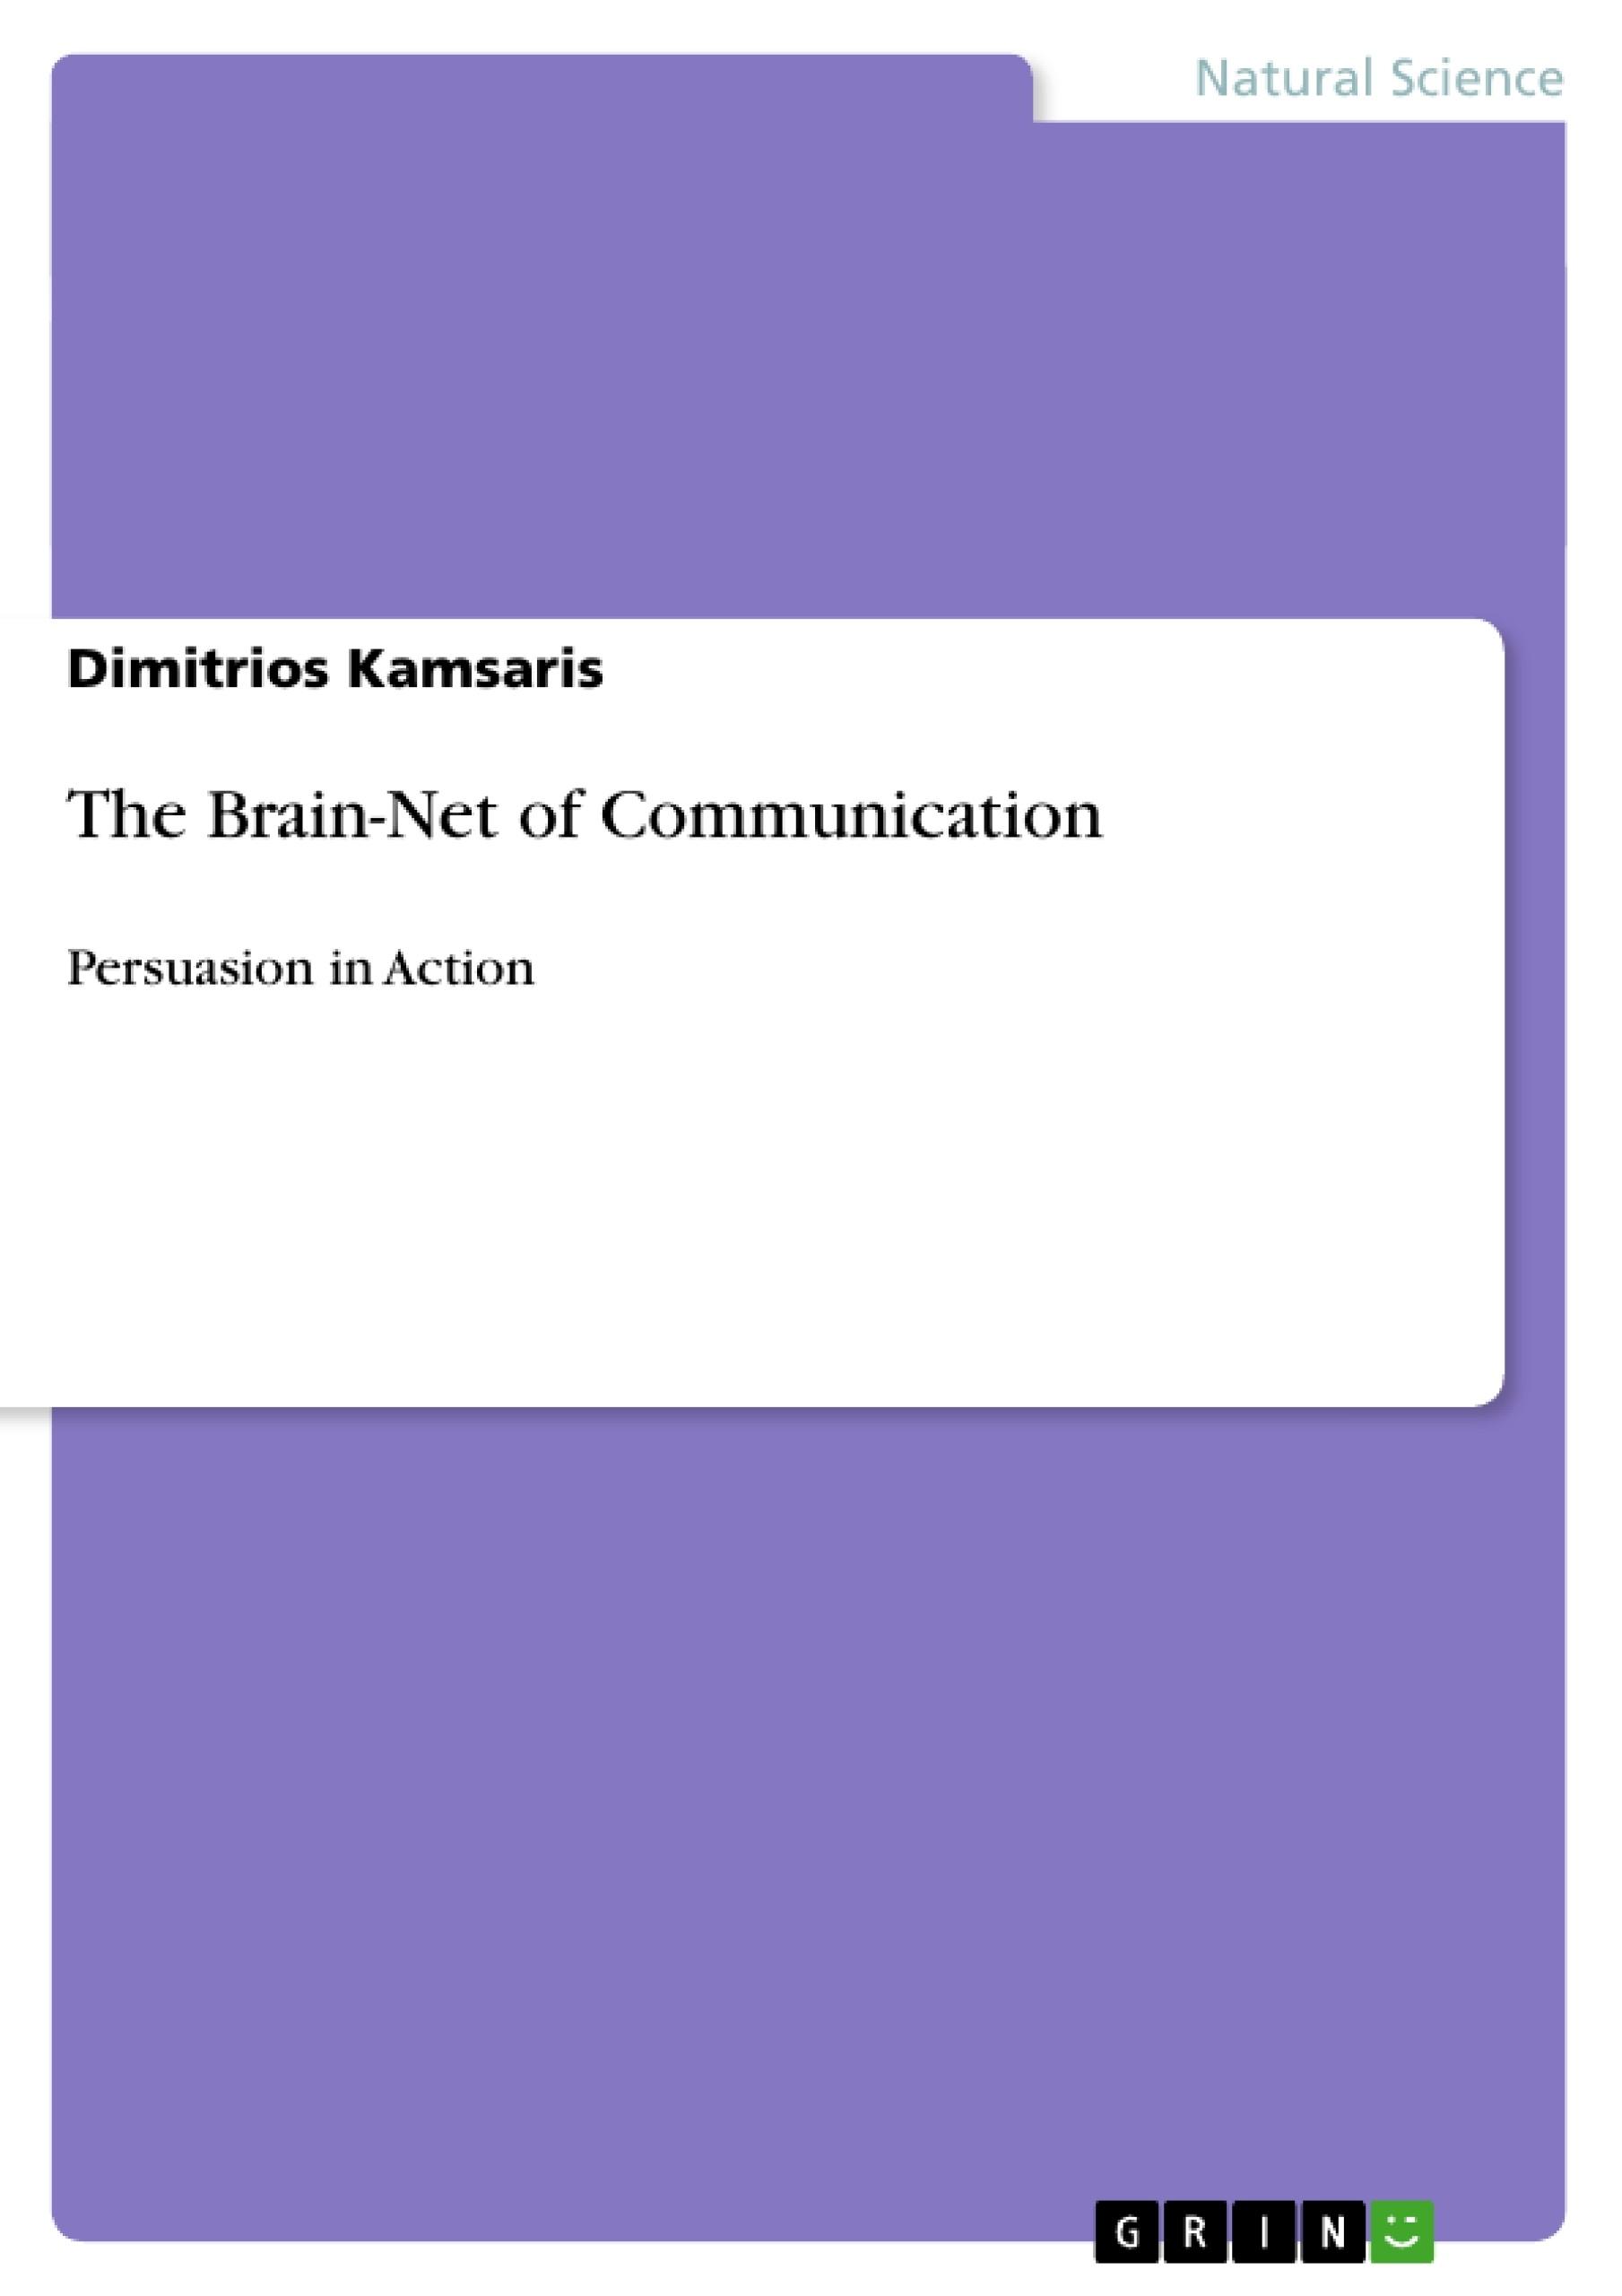 Title: The Brain-Net of Communication